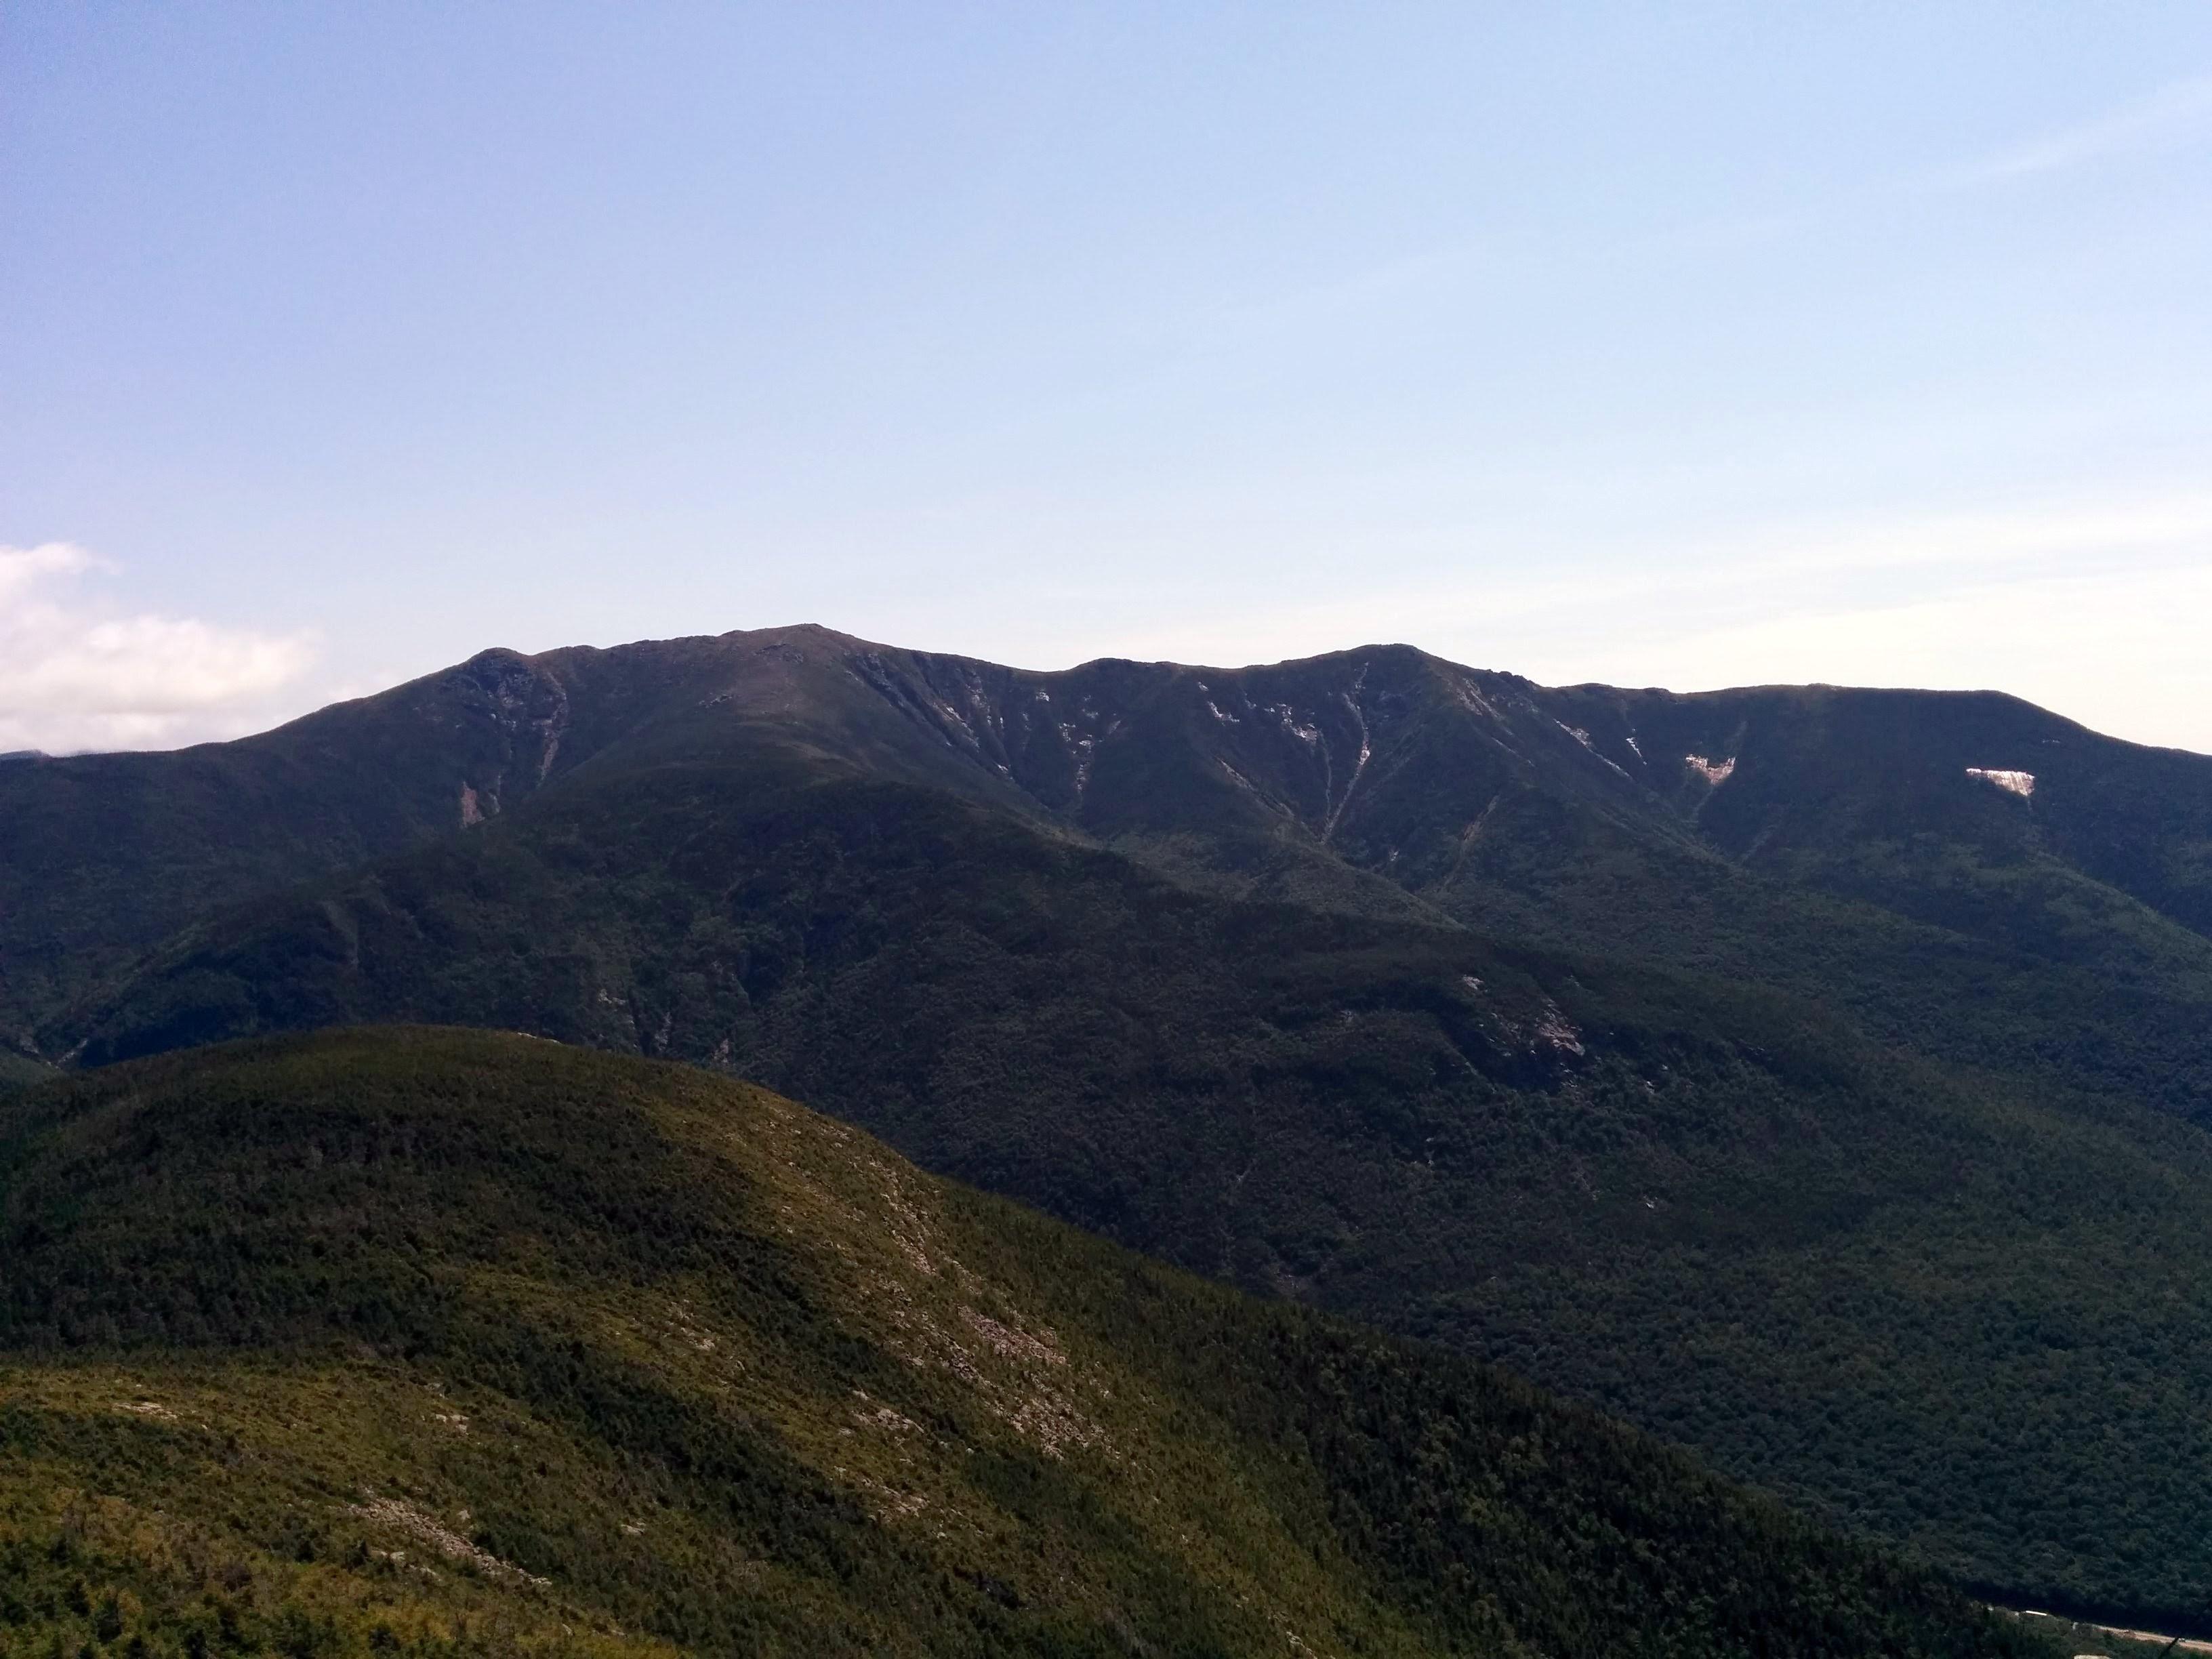 Photo: View of the next ridge over.